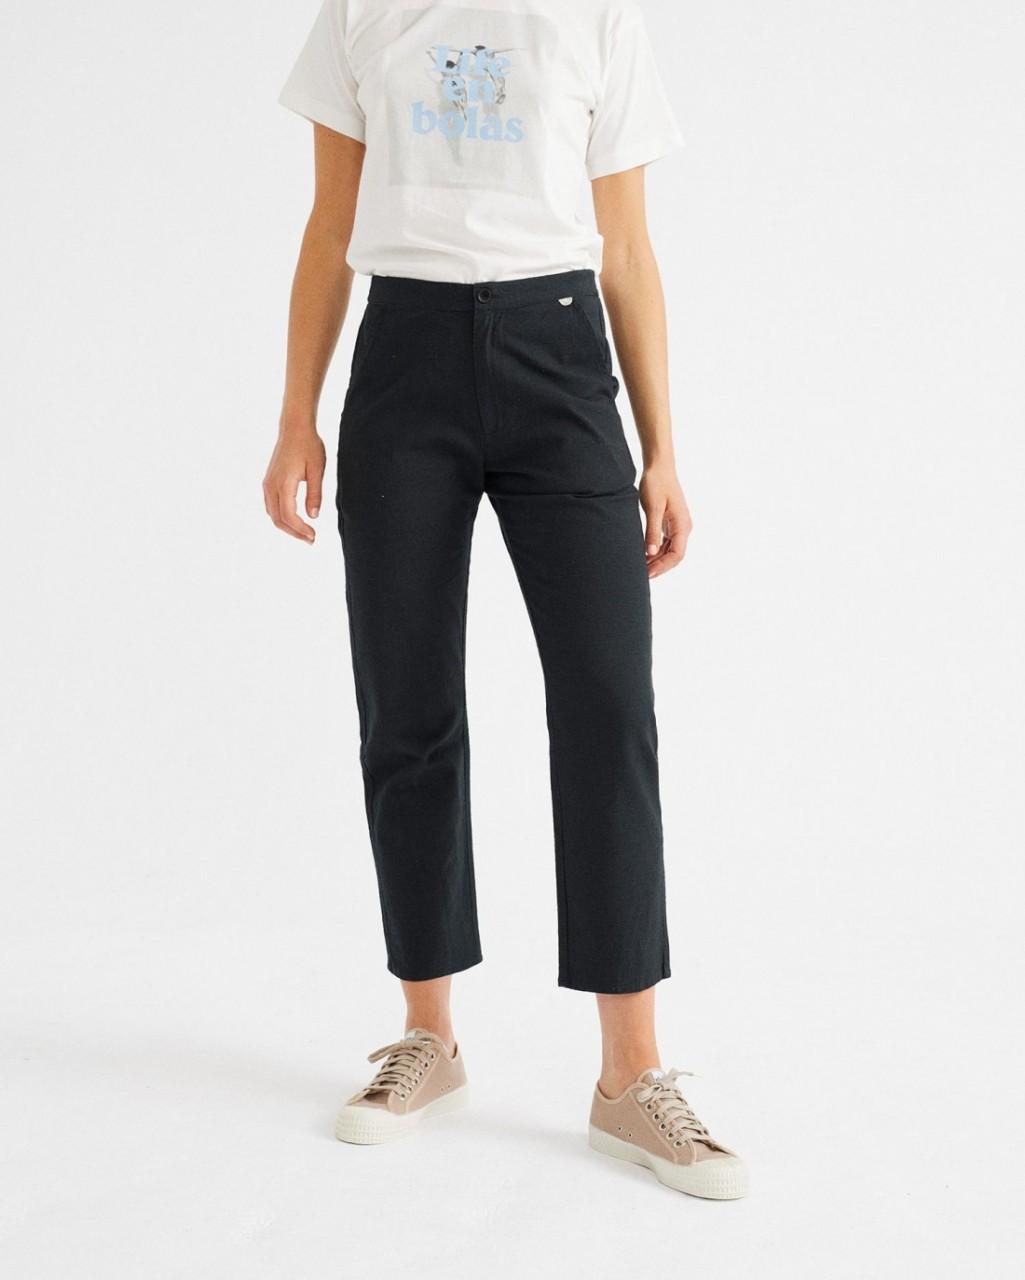 BLACK DAPHNE PANTS